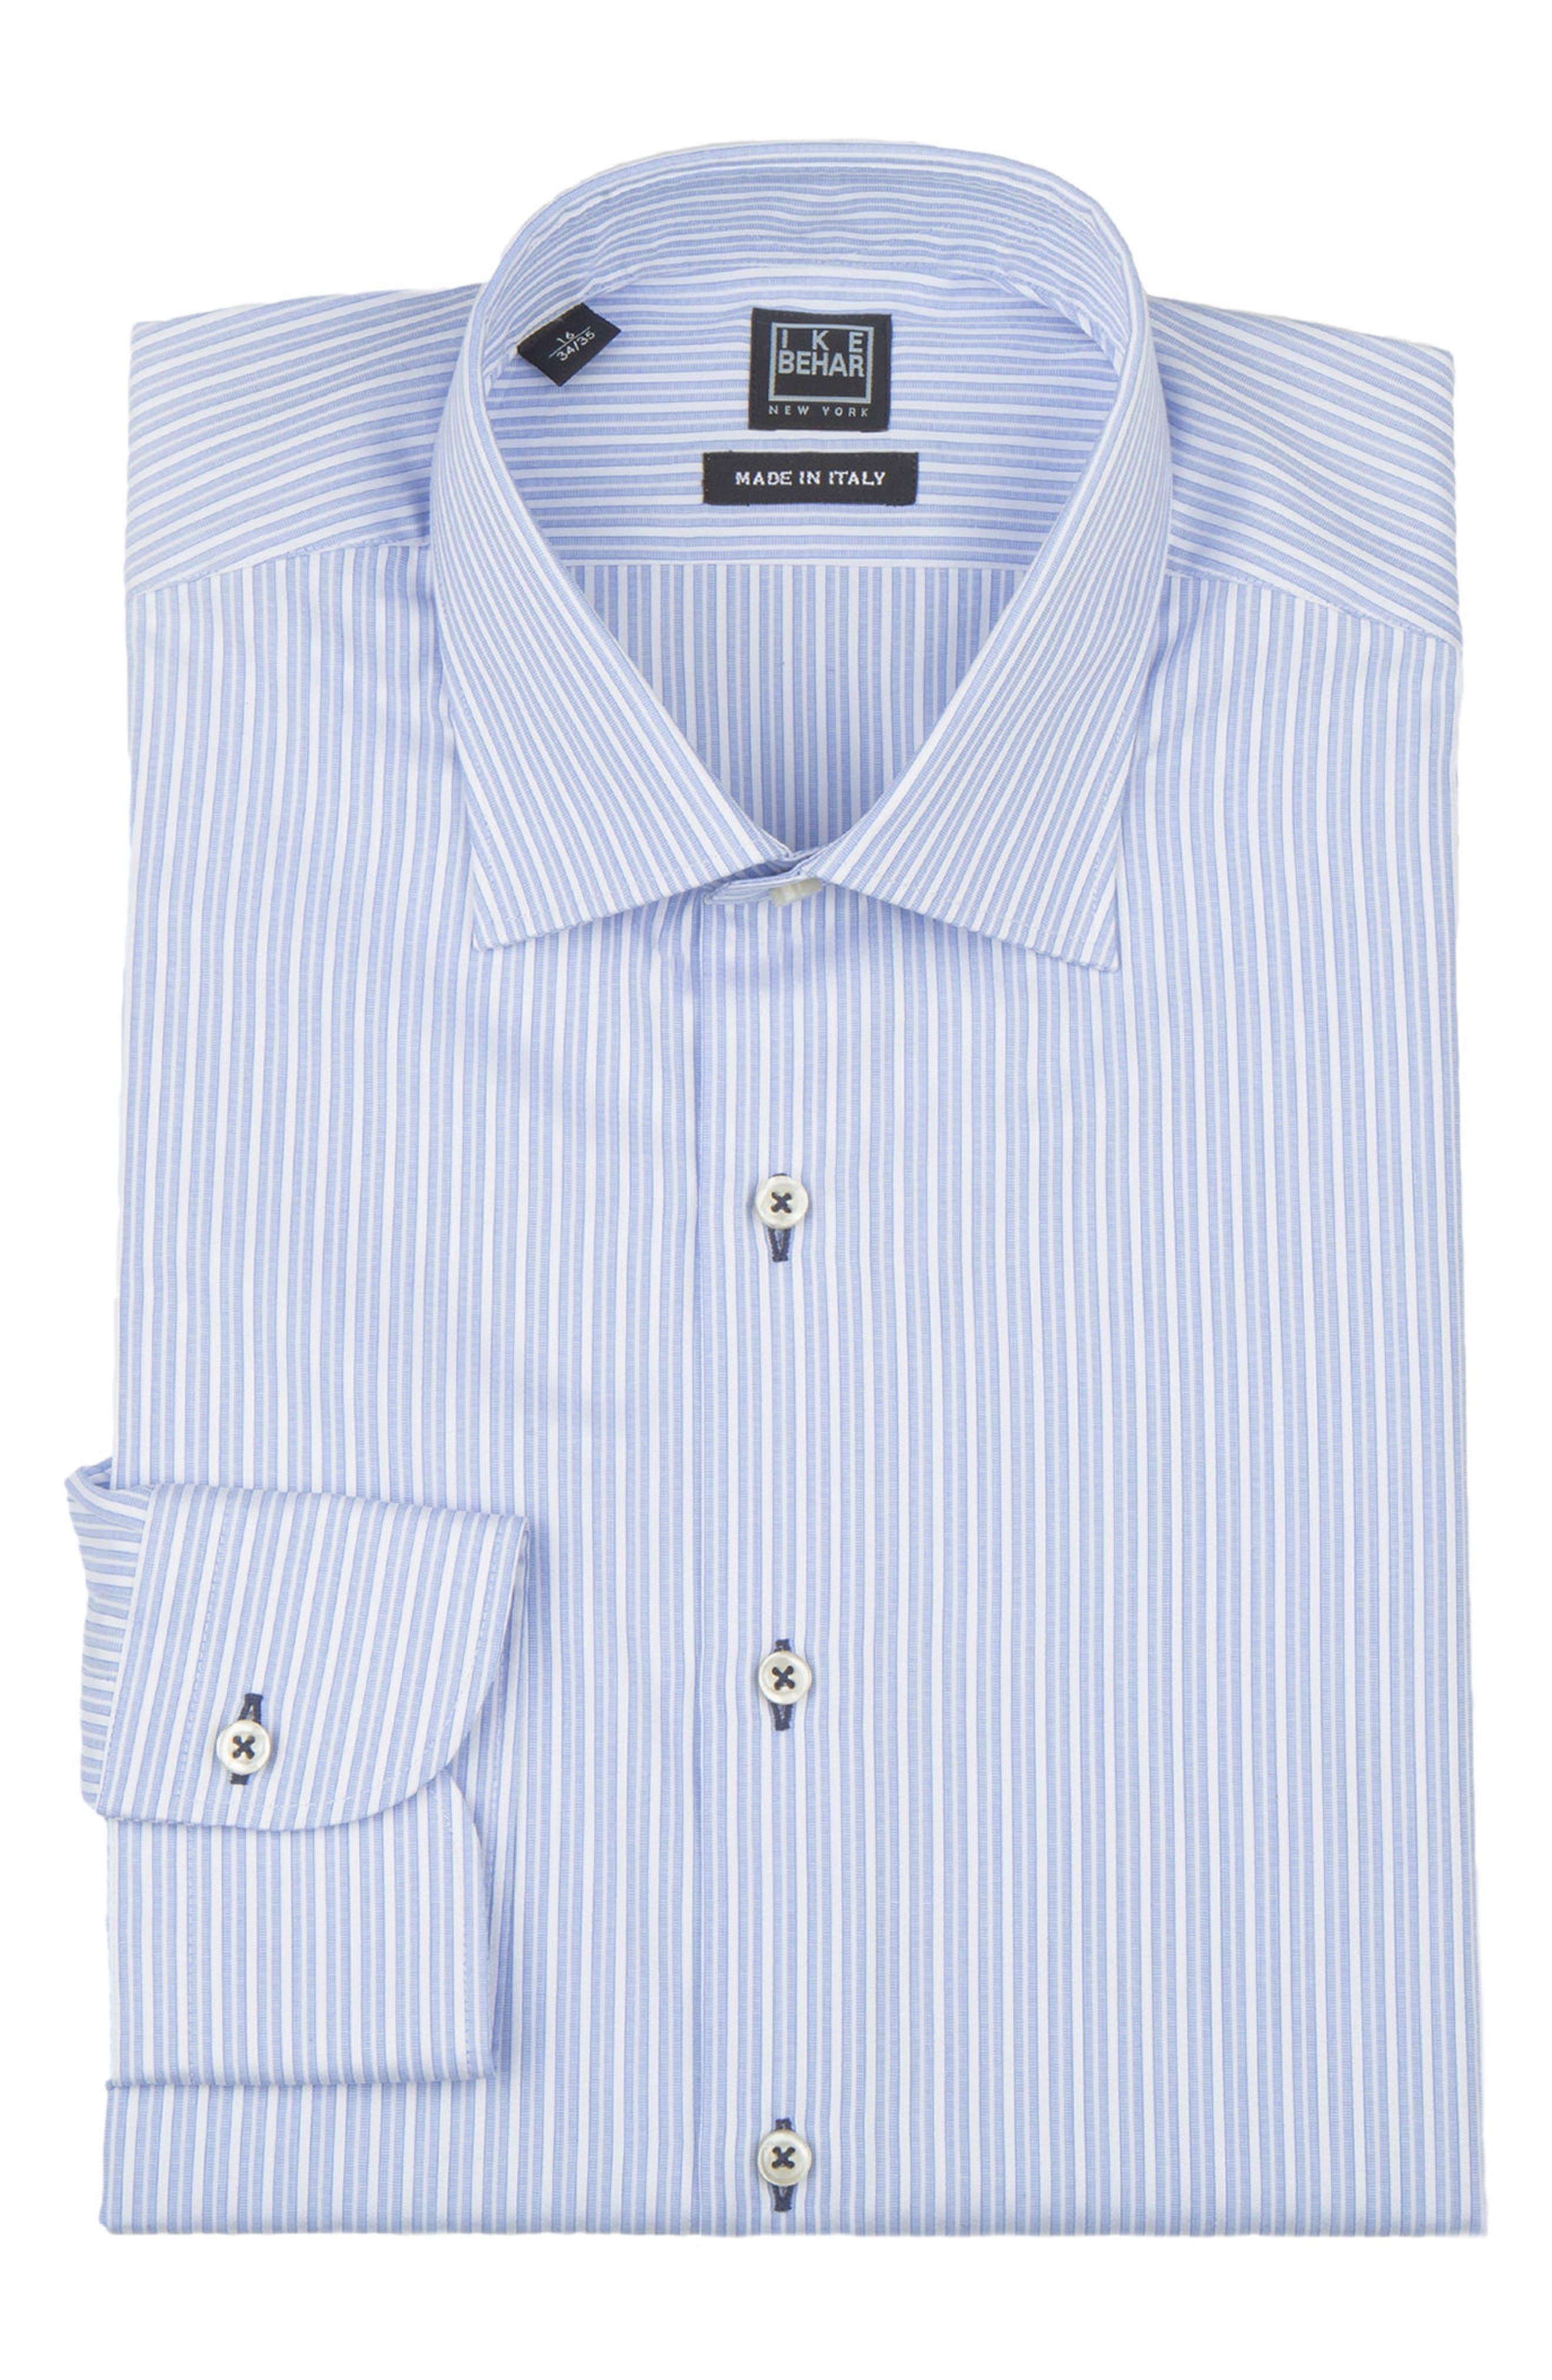 Regular Fit Stripe Dress Shirt,                             Alternate thumbnail 5, color,                             LIGHT BLUE